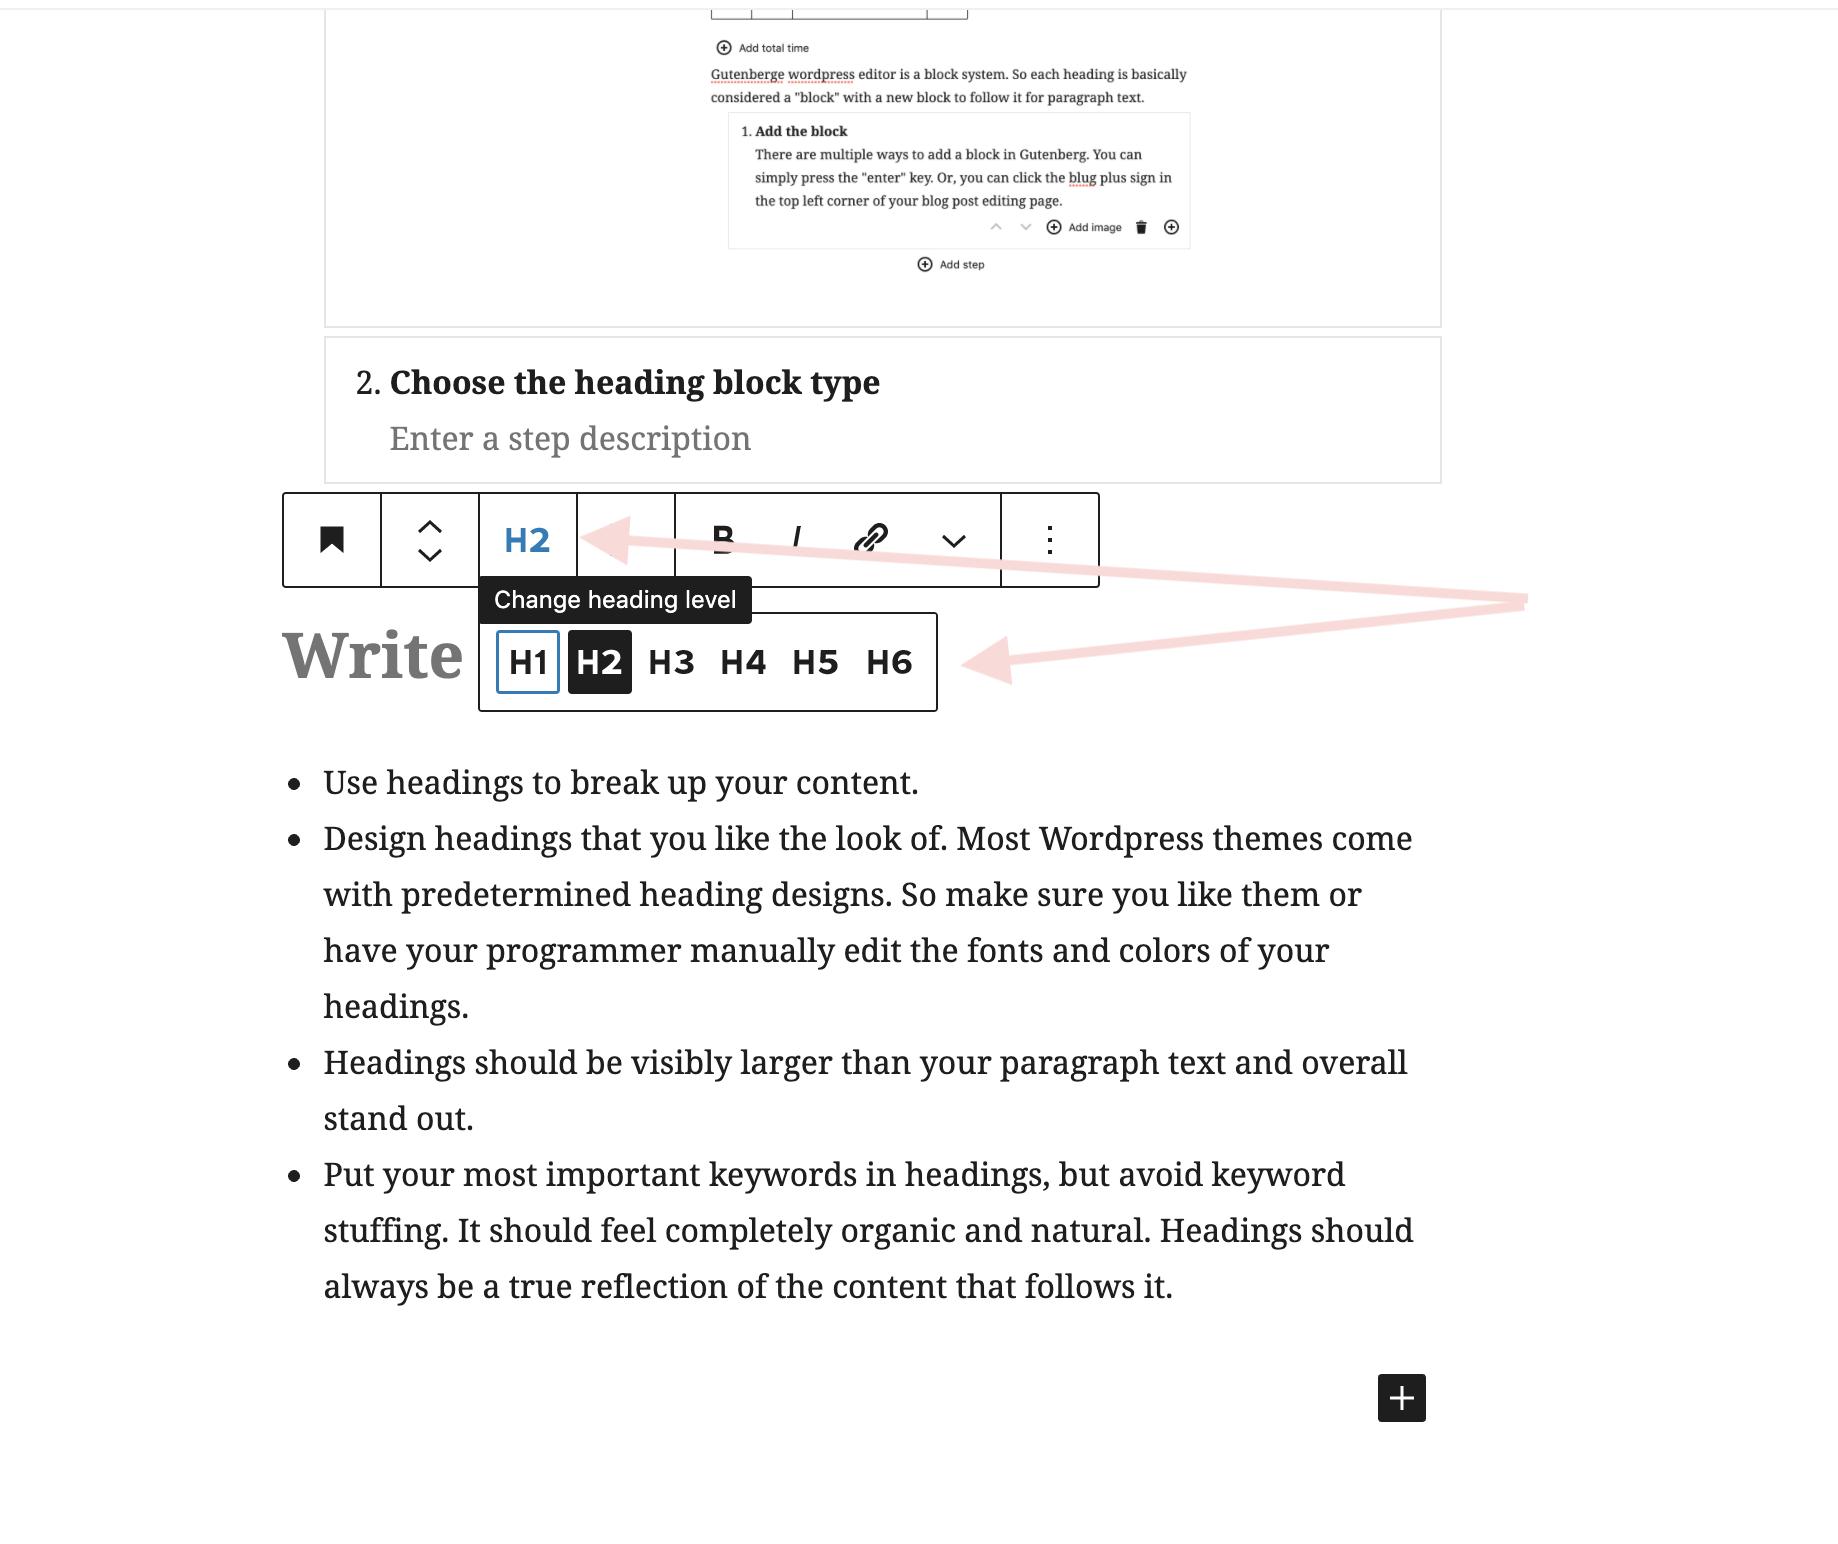 Where to click to change subheading level in WordPress Gutenberg block editor